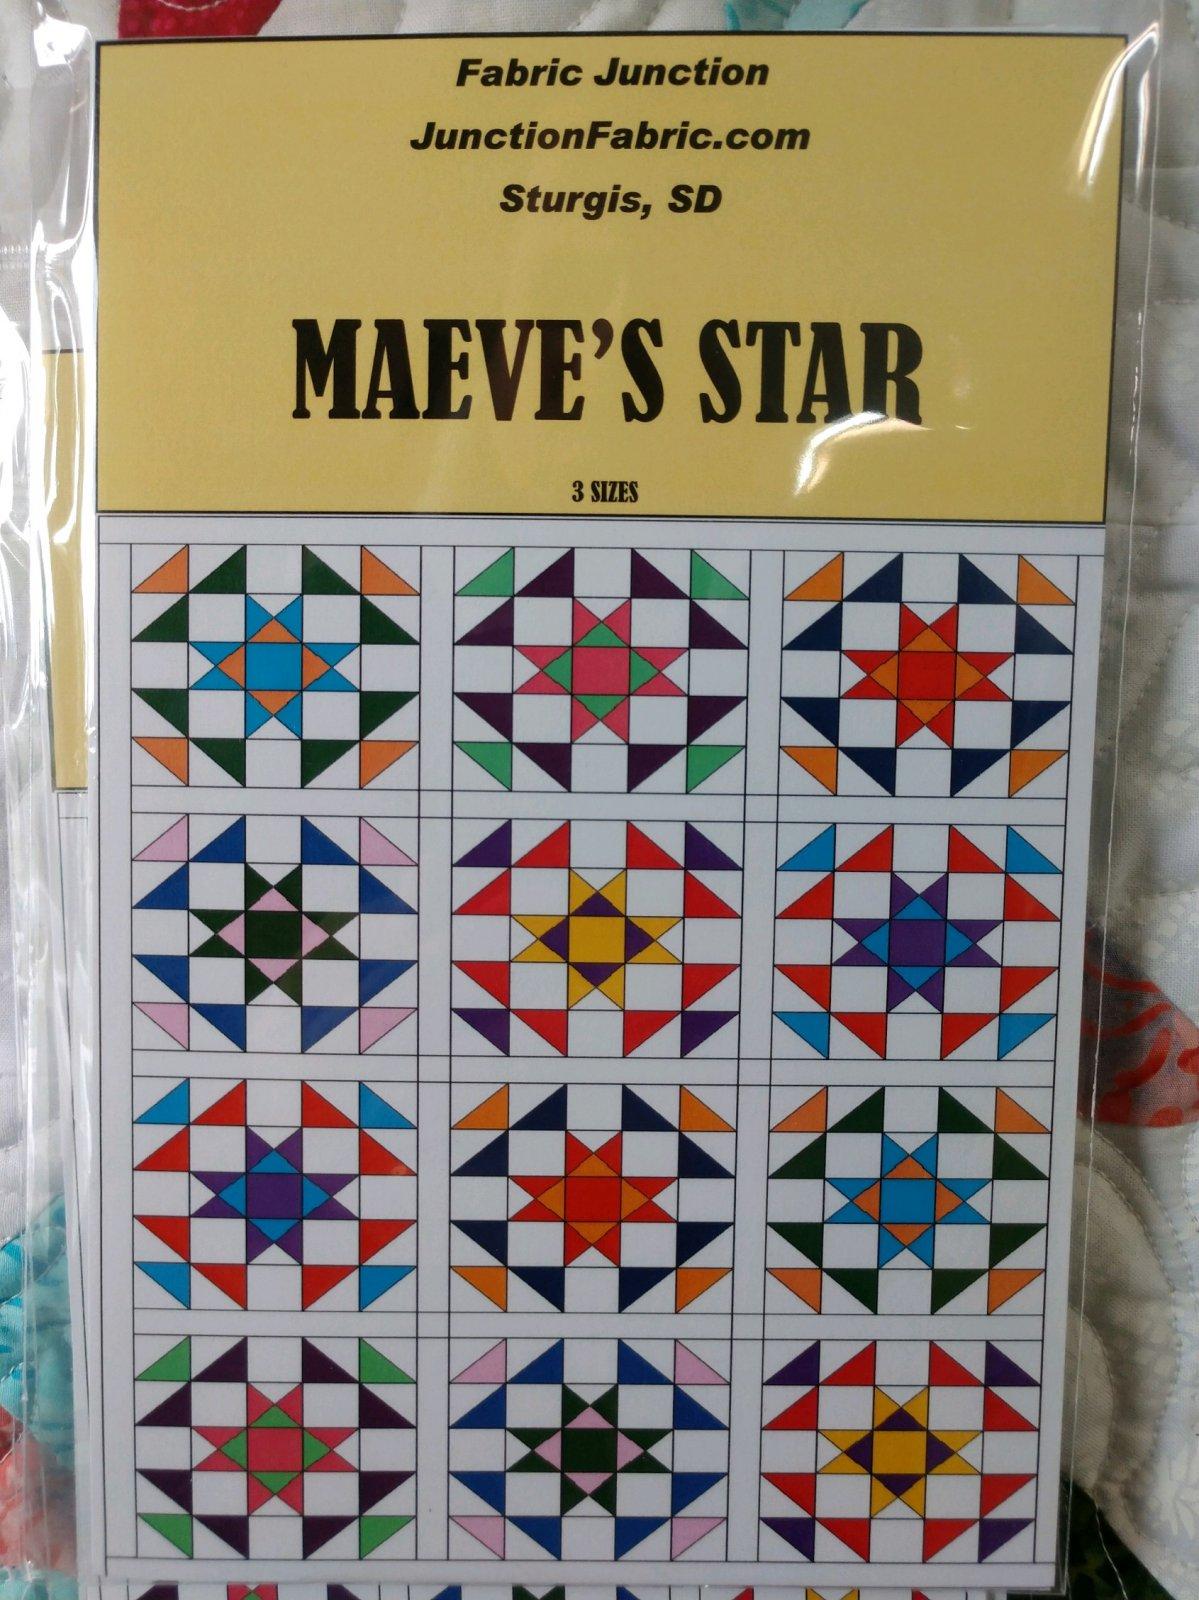 Maeve's Star